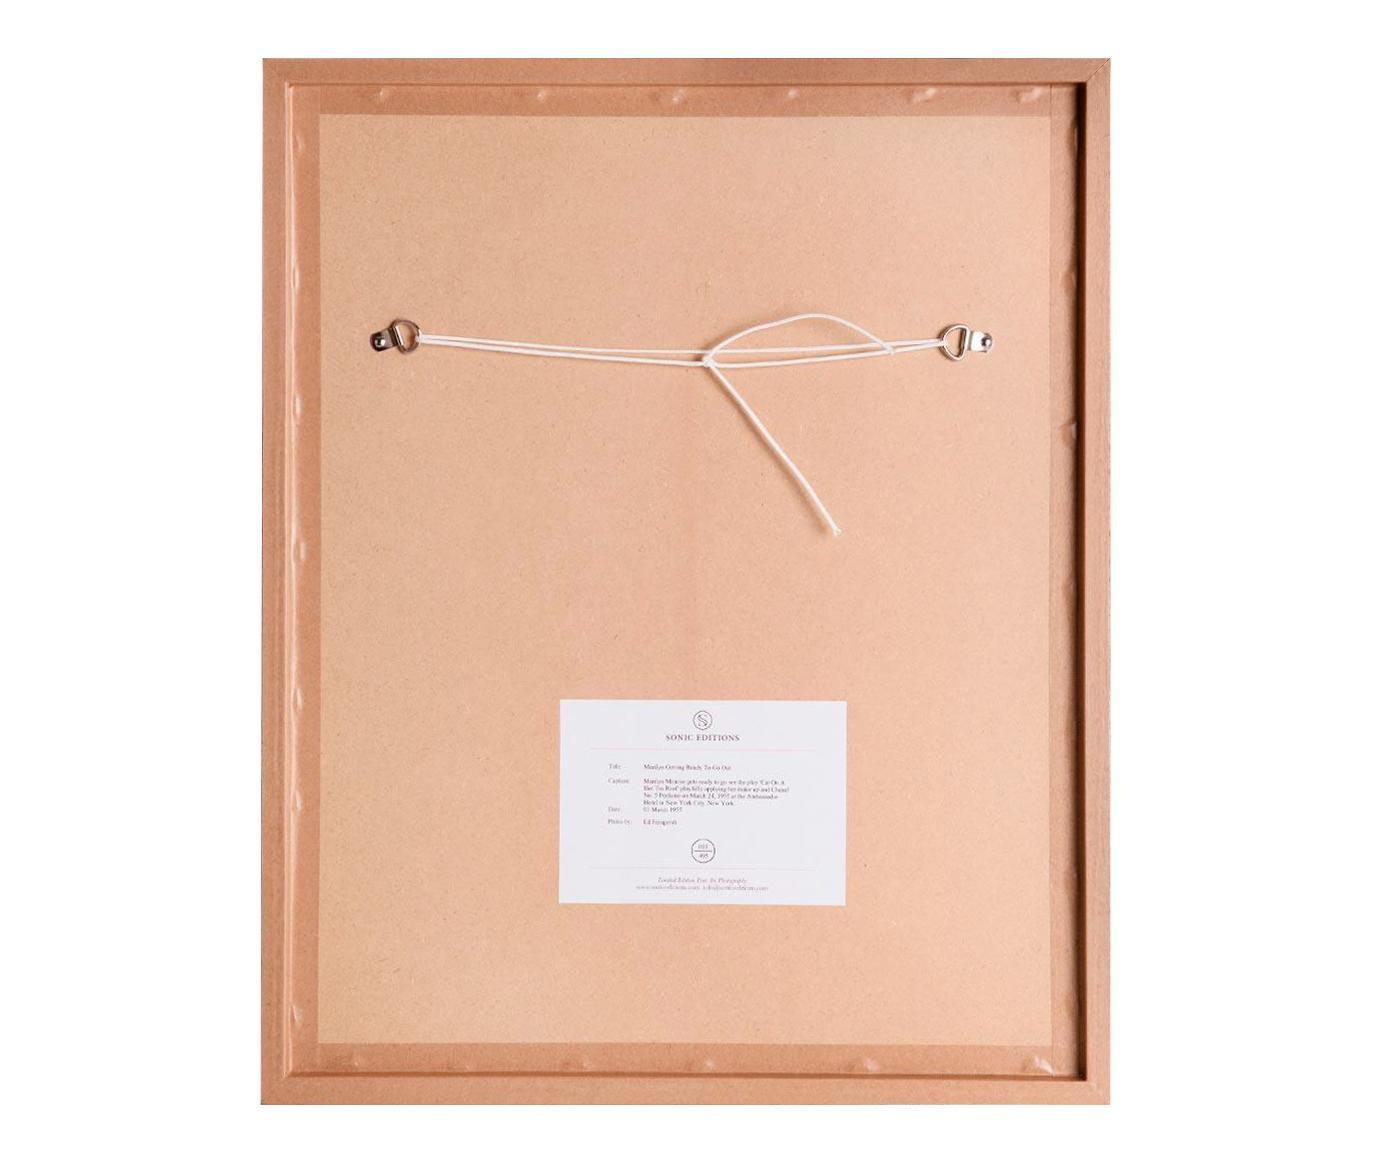 Gerahmter Fotodruck Connery, Bild: Fuji Crystal Archive Papi, Rahmen: Plexiglasscheibe, Holz, l, Schwarz,Weiß, 40 x 50 cm